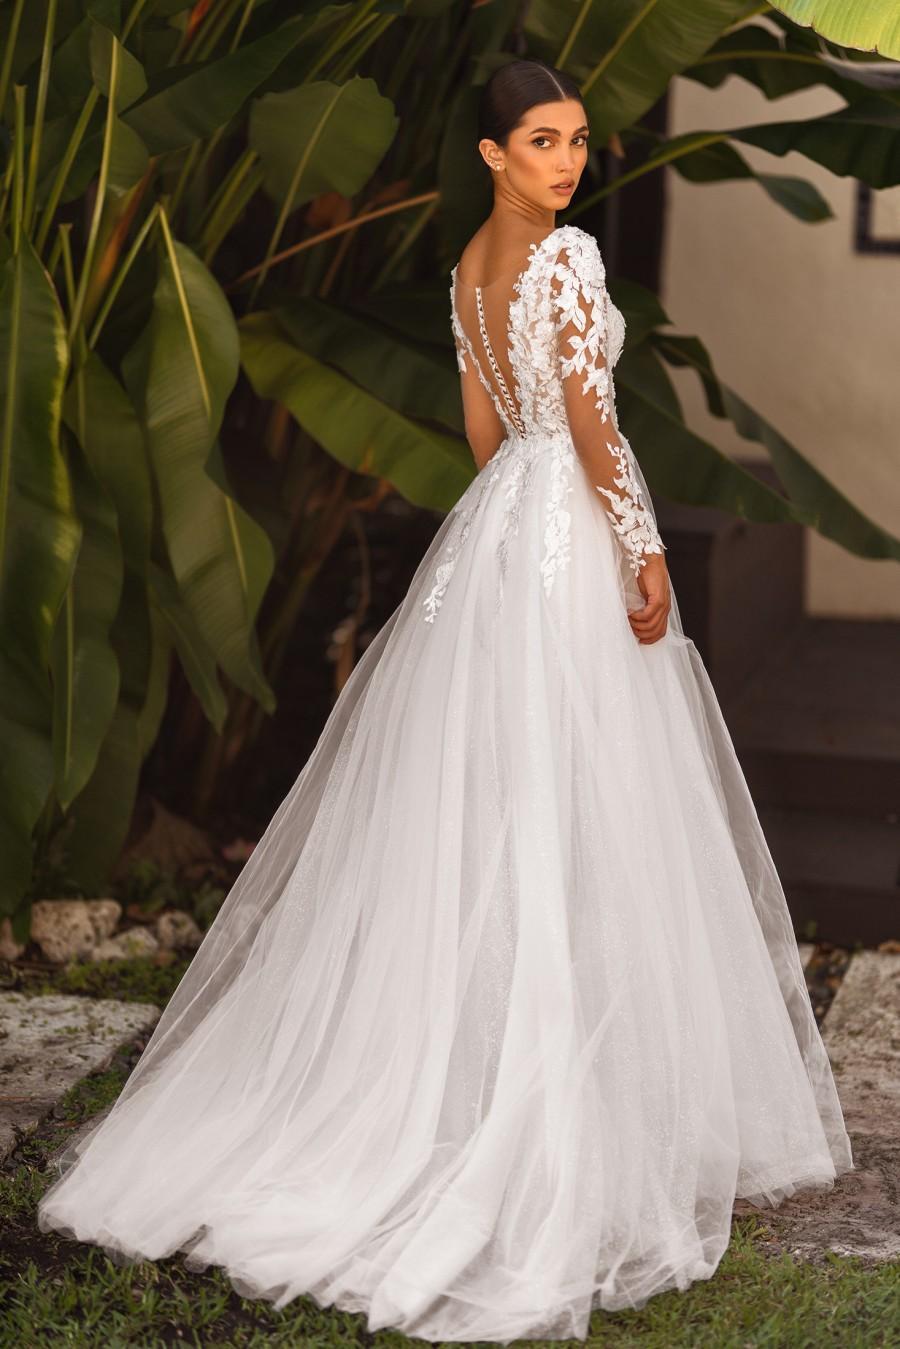 Wedding - Long sleeve wedding dress, A-line bridal gown, Lace wedding dress, Ivory bridal dress, Maxi wedding dress, Split dress, Romantic tulle dress